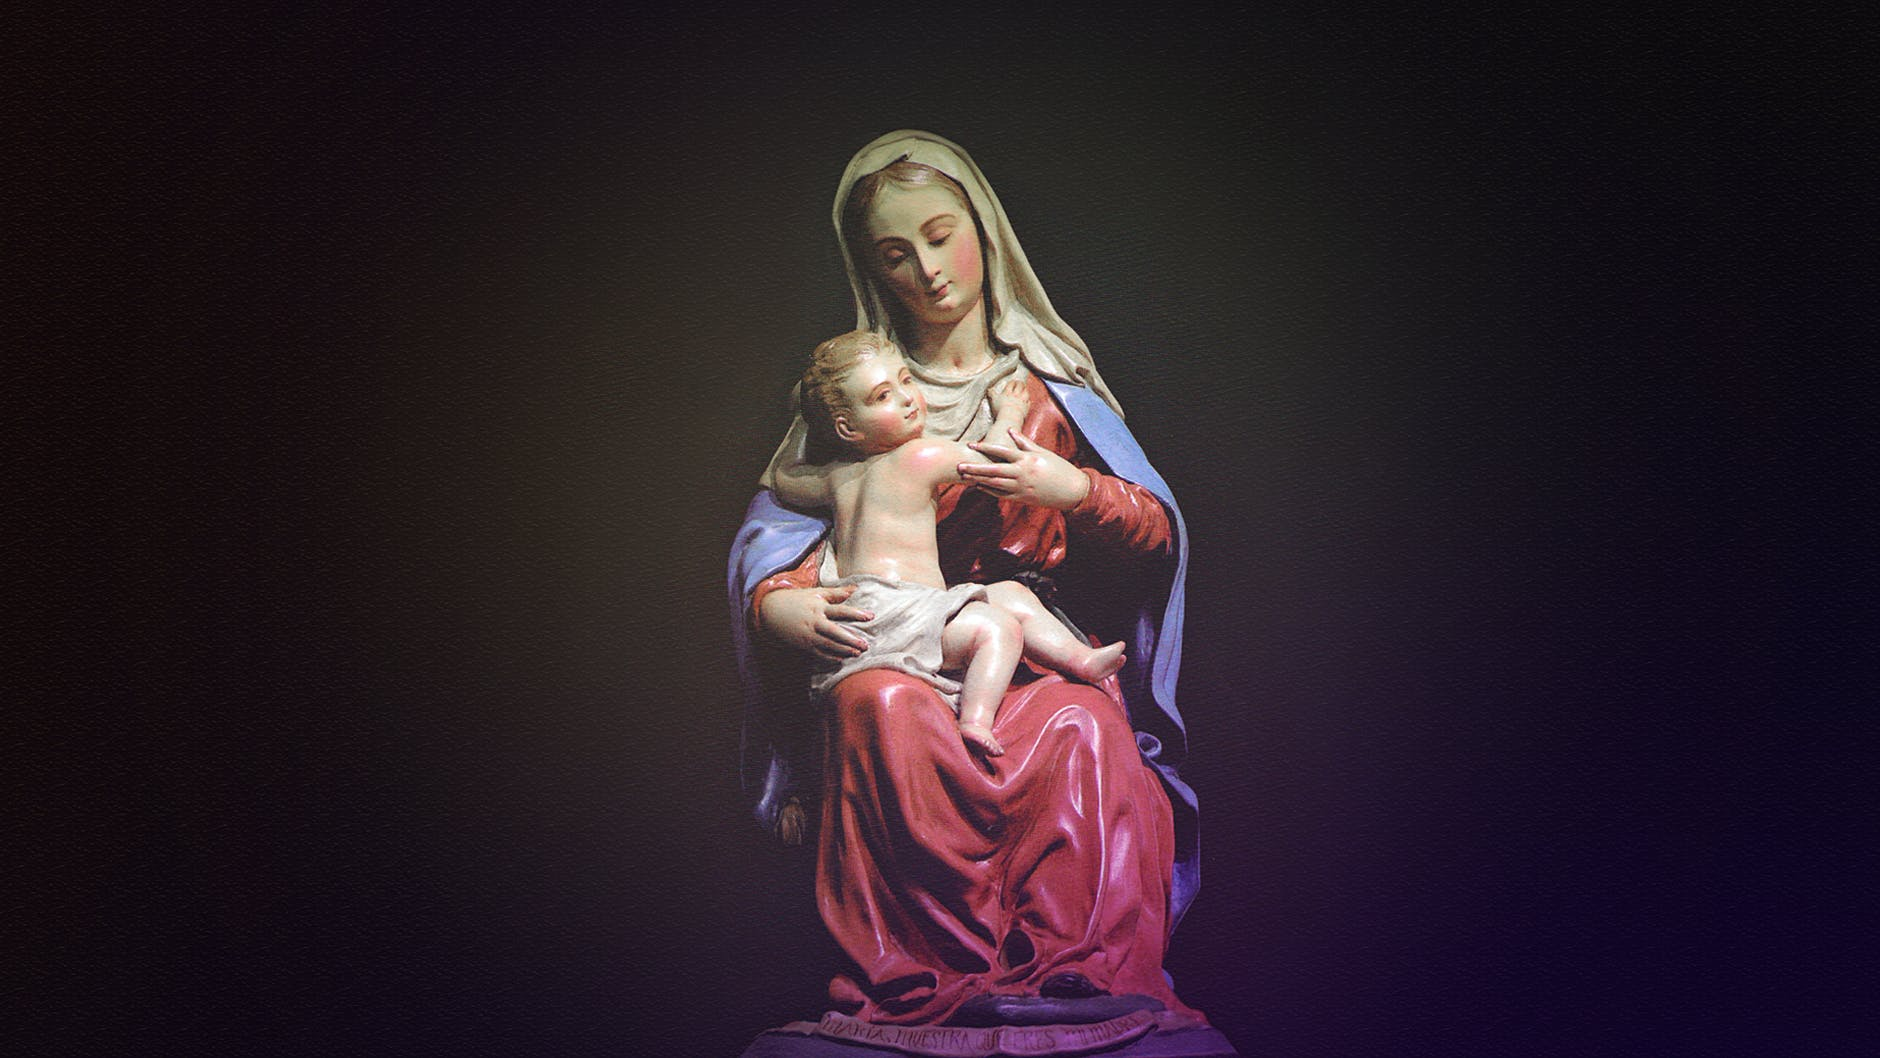 maria mery sant